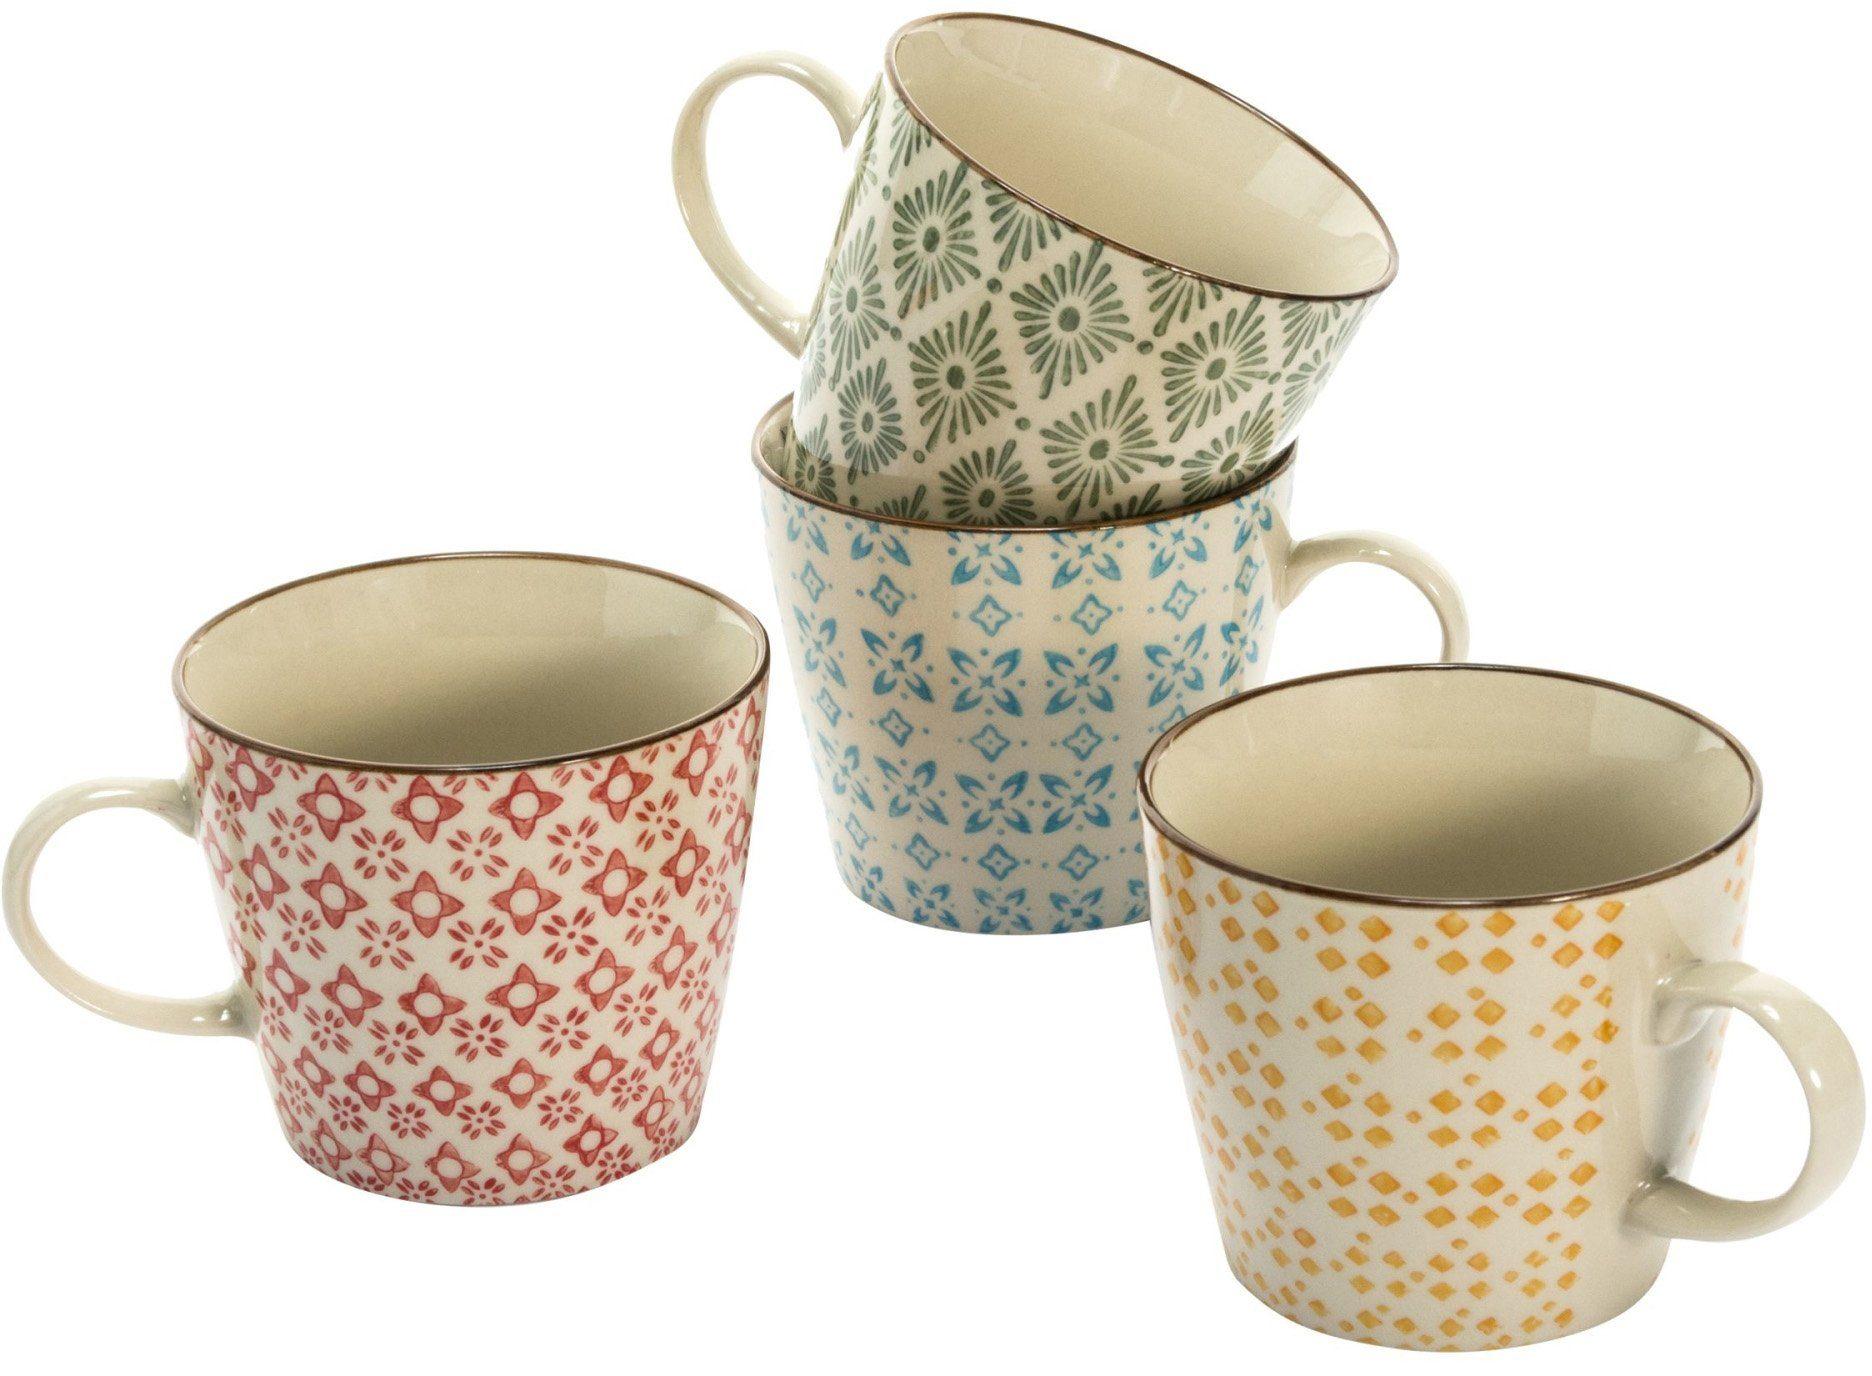 Mailord Keramik-Becher-Set, 4-tlg.